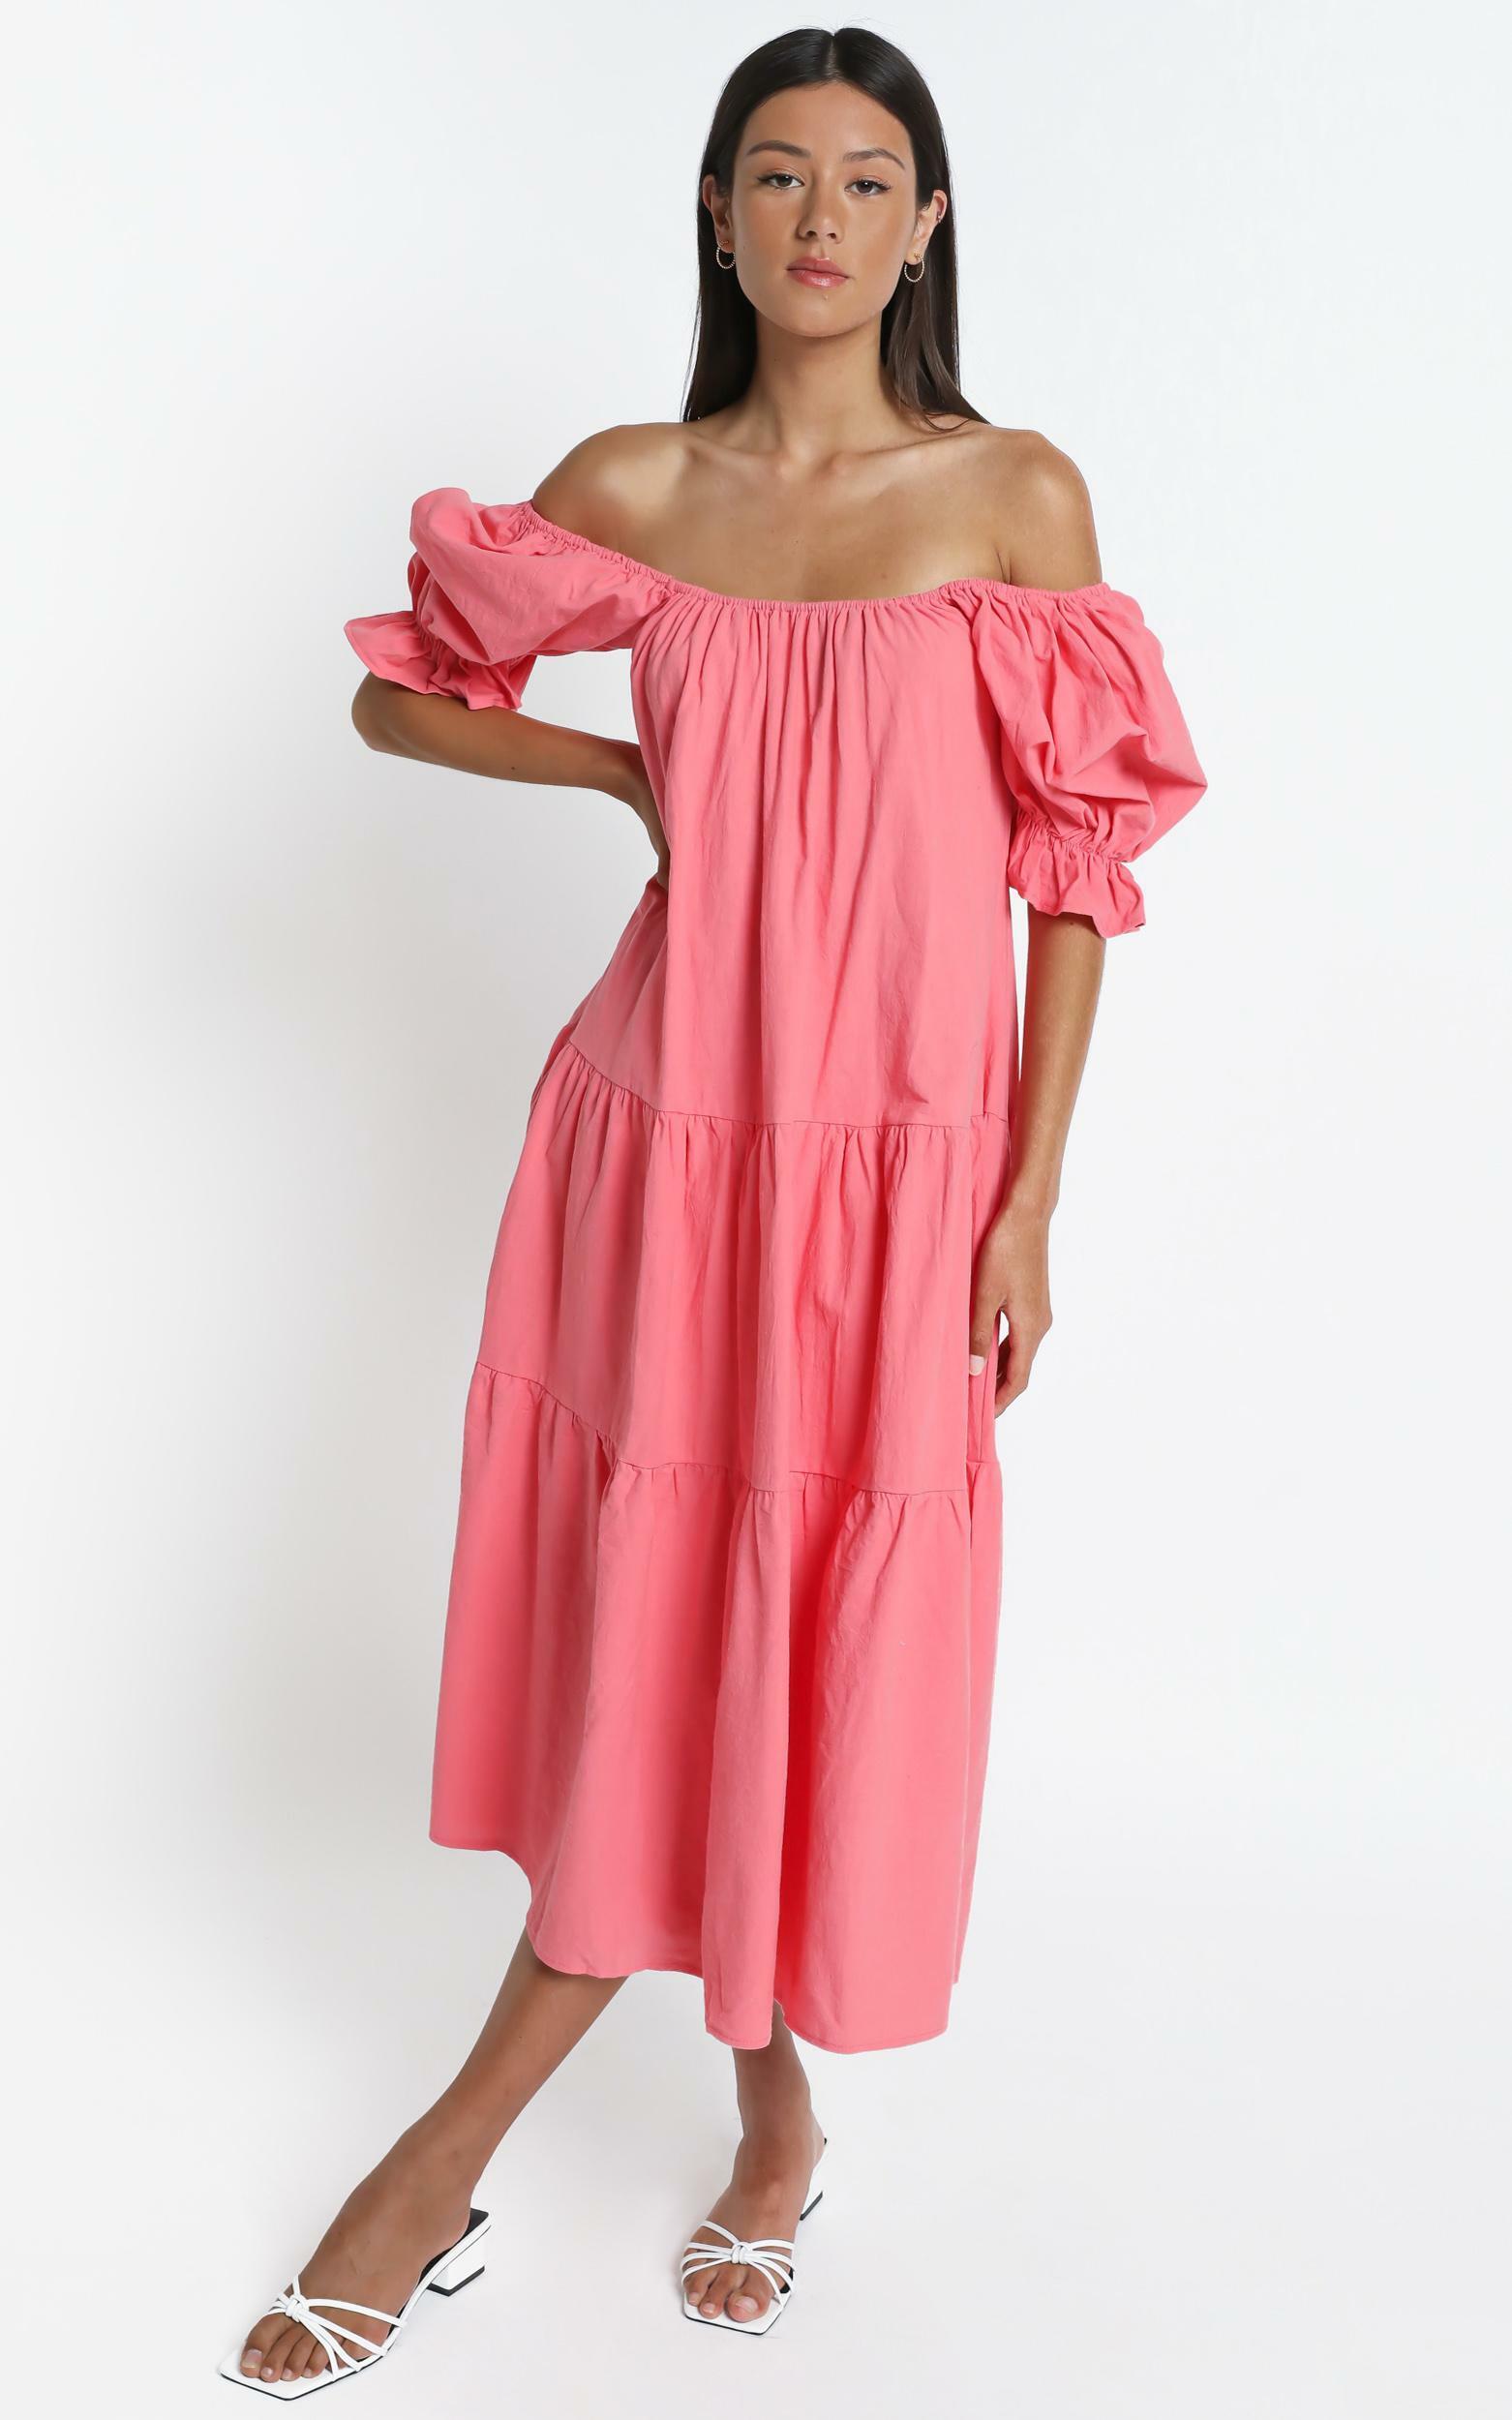 Zaharrah Dress in Coral Linen Look - 6 (XS), PNK14, hi-res image number null